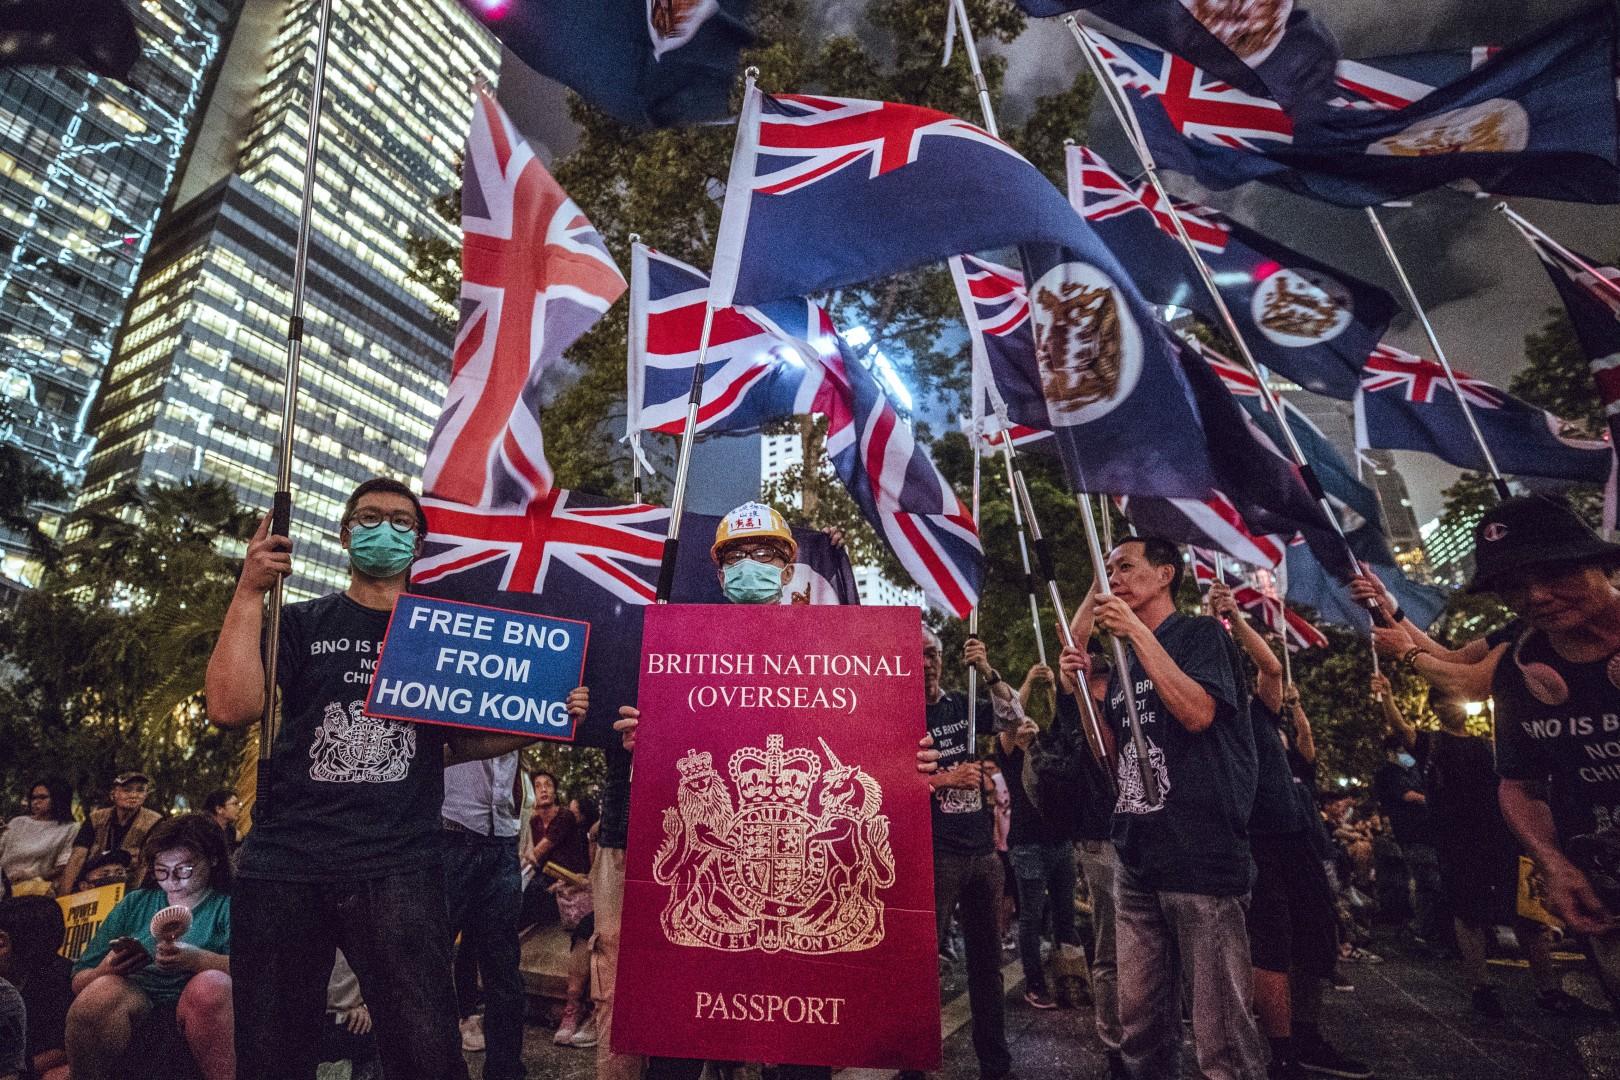 hongkong-uk.jpg